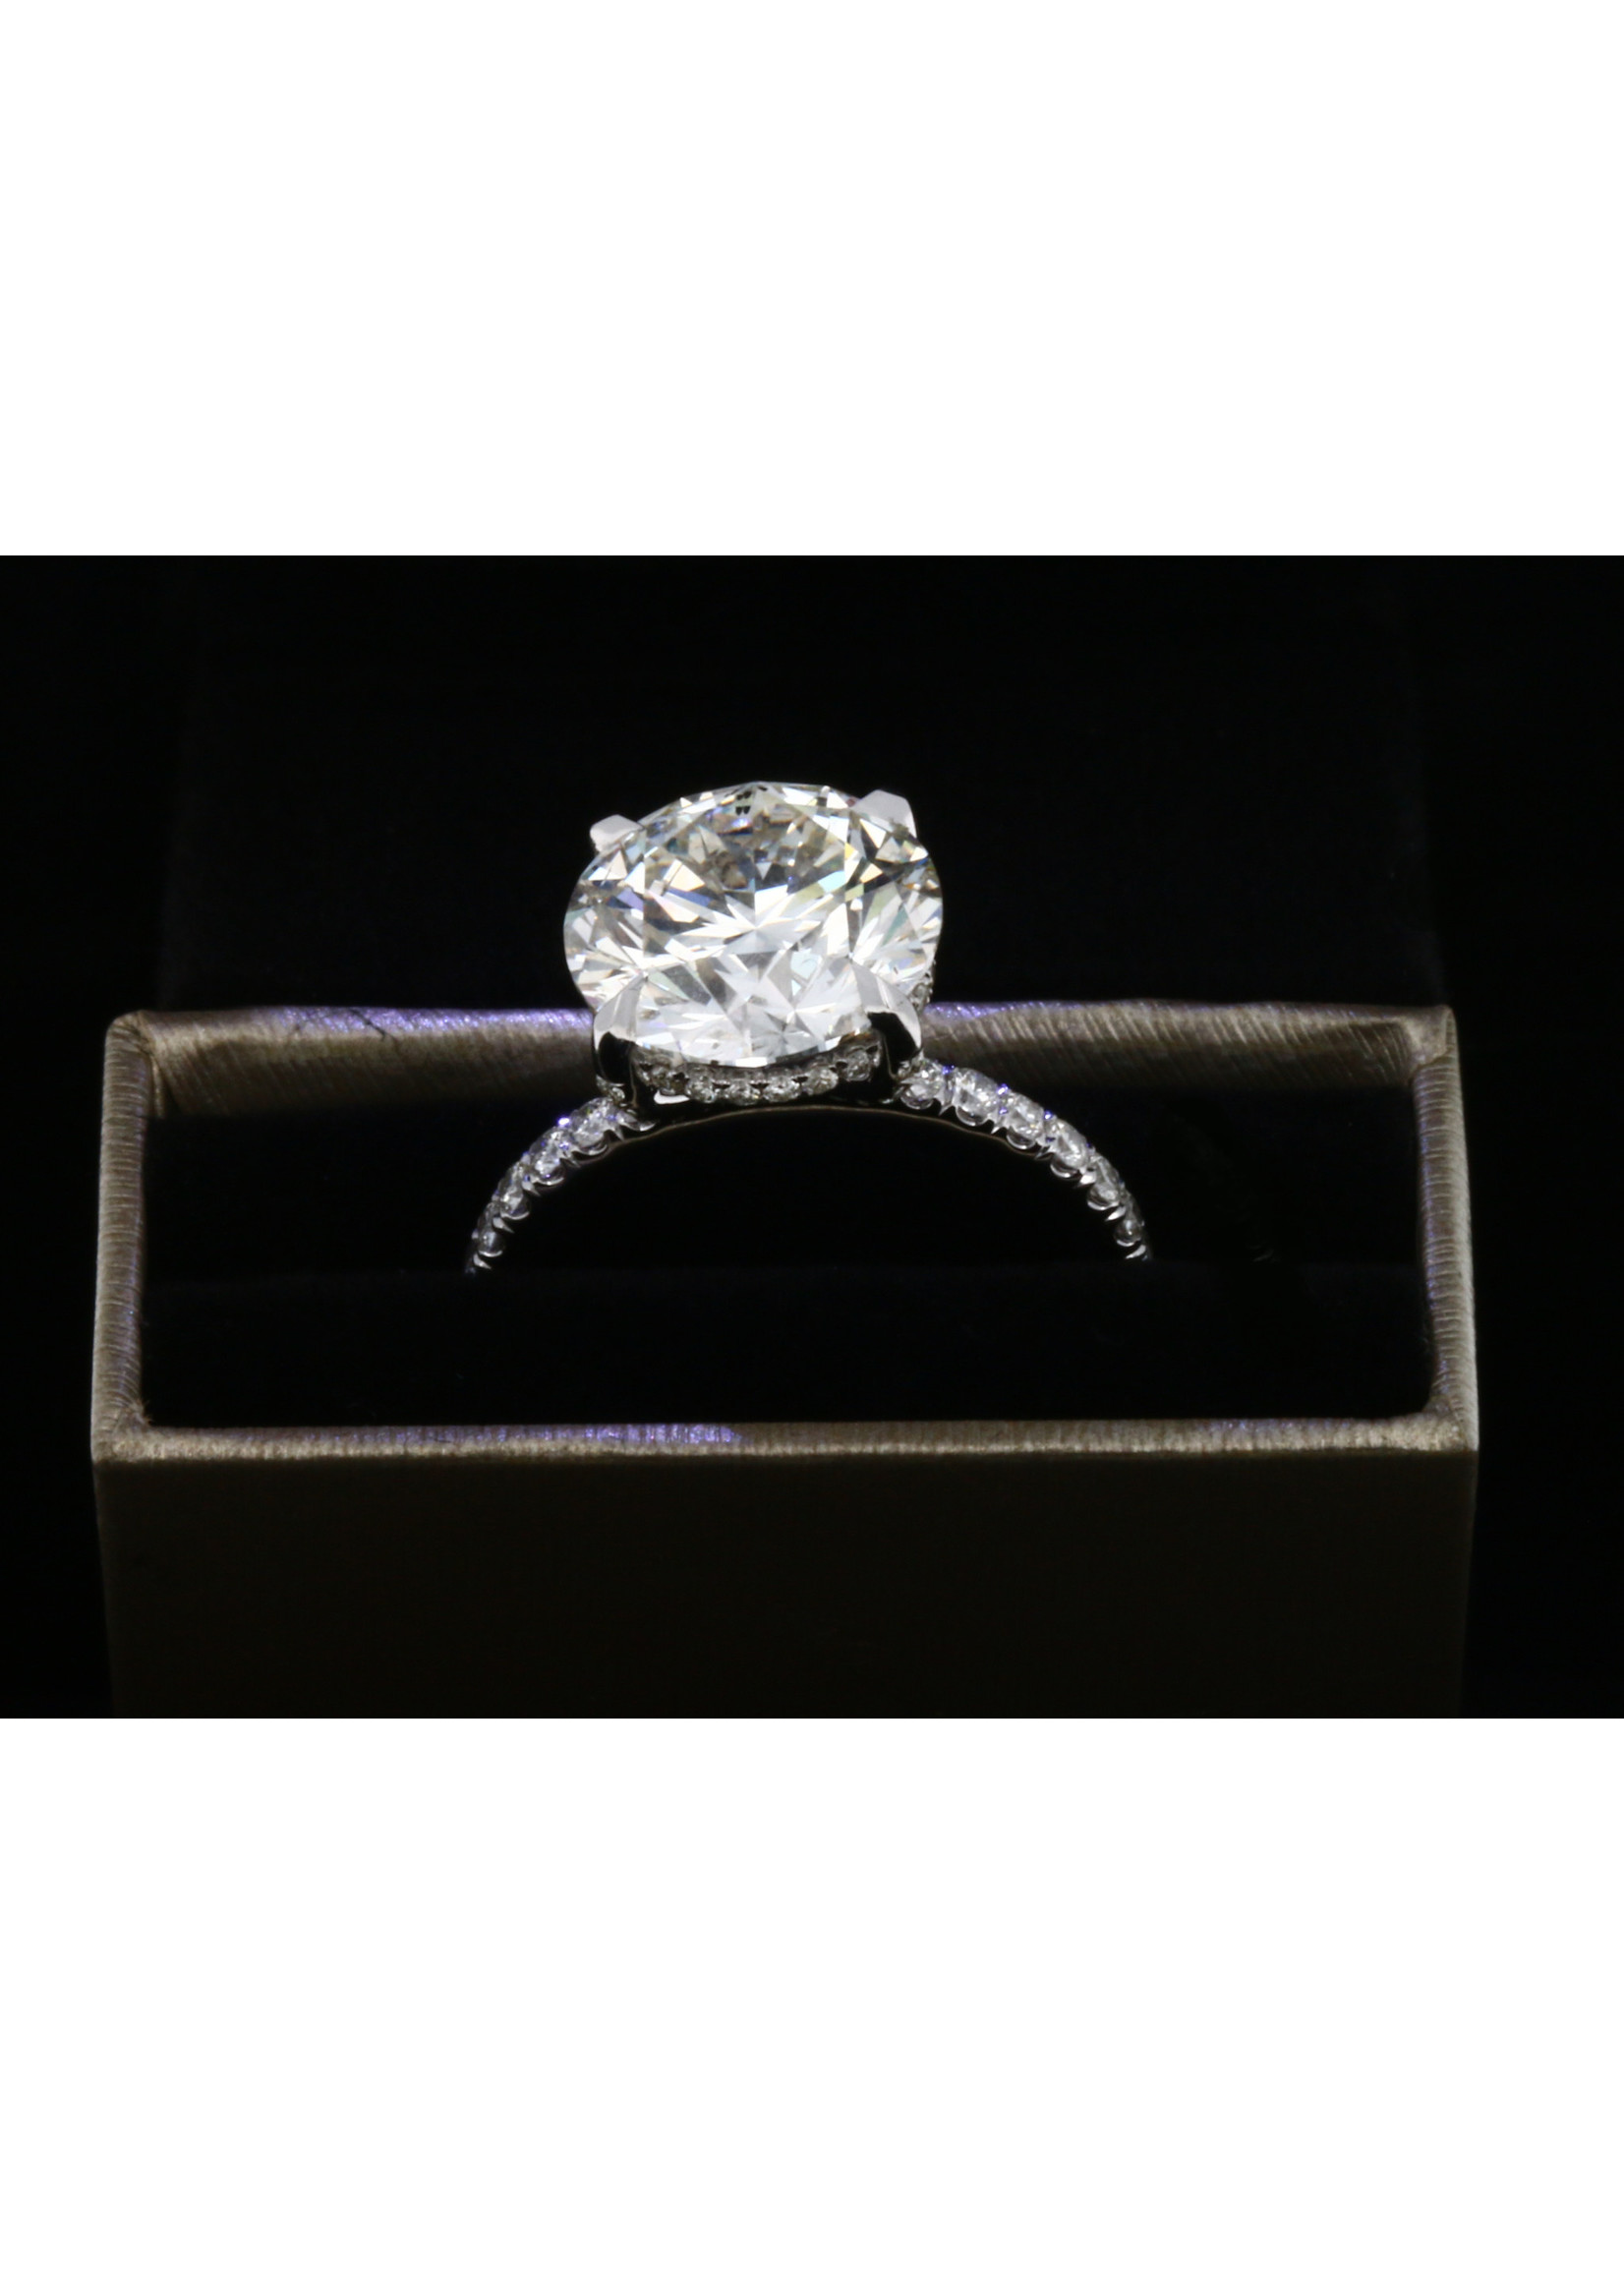 5.04 CT ROUND CUT DIAMOND RING SI1-H